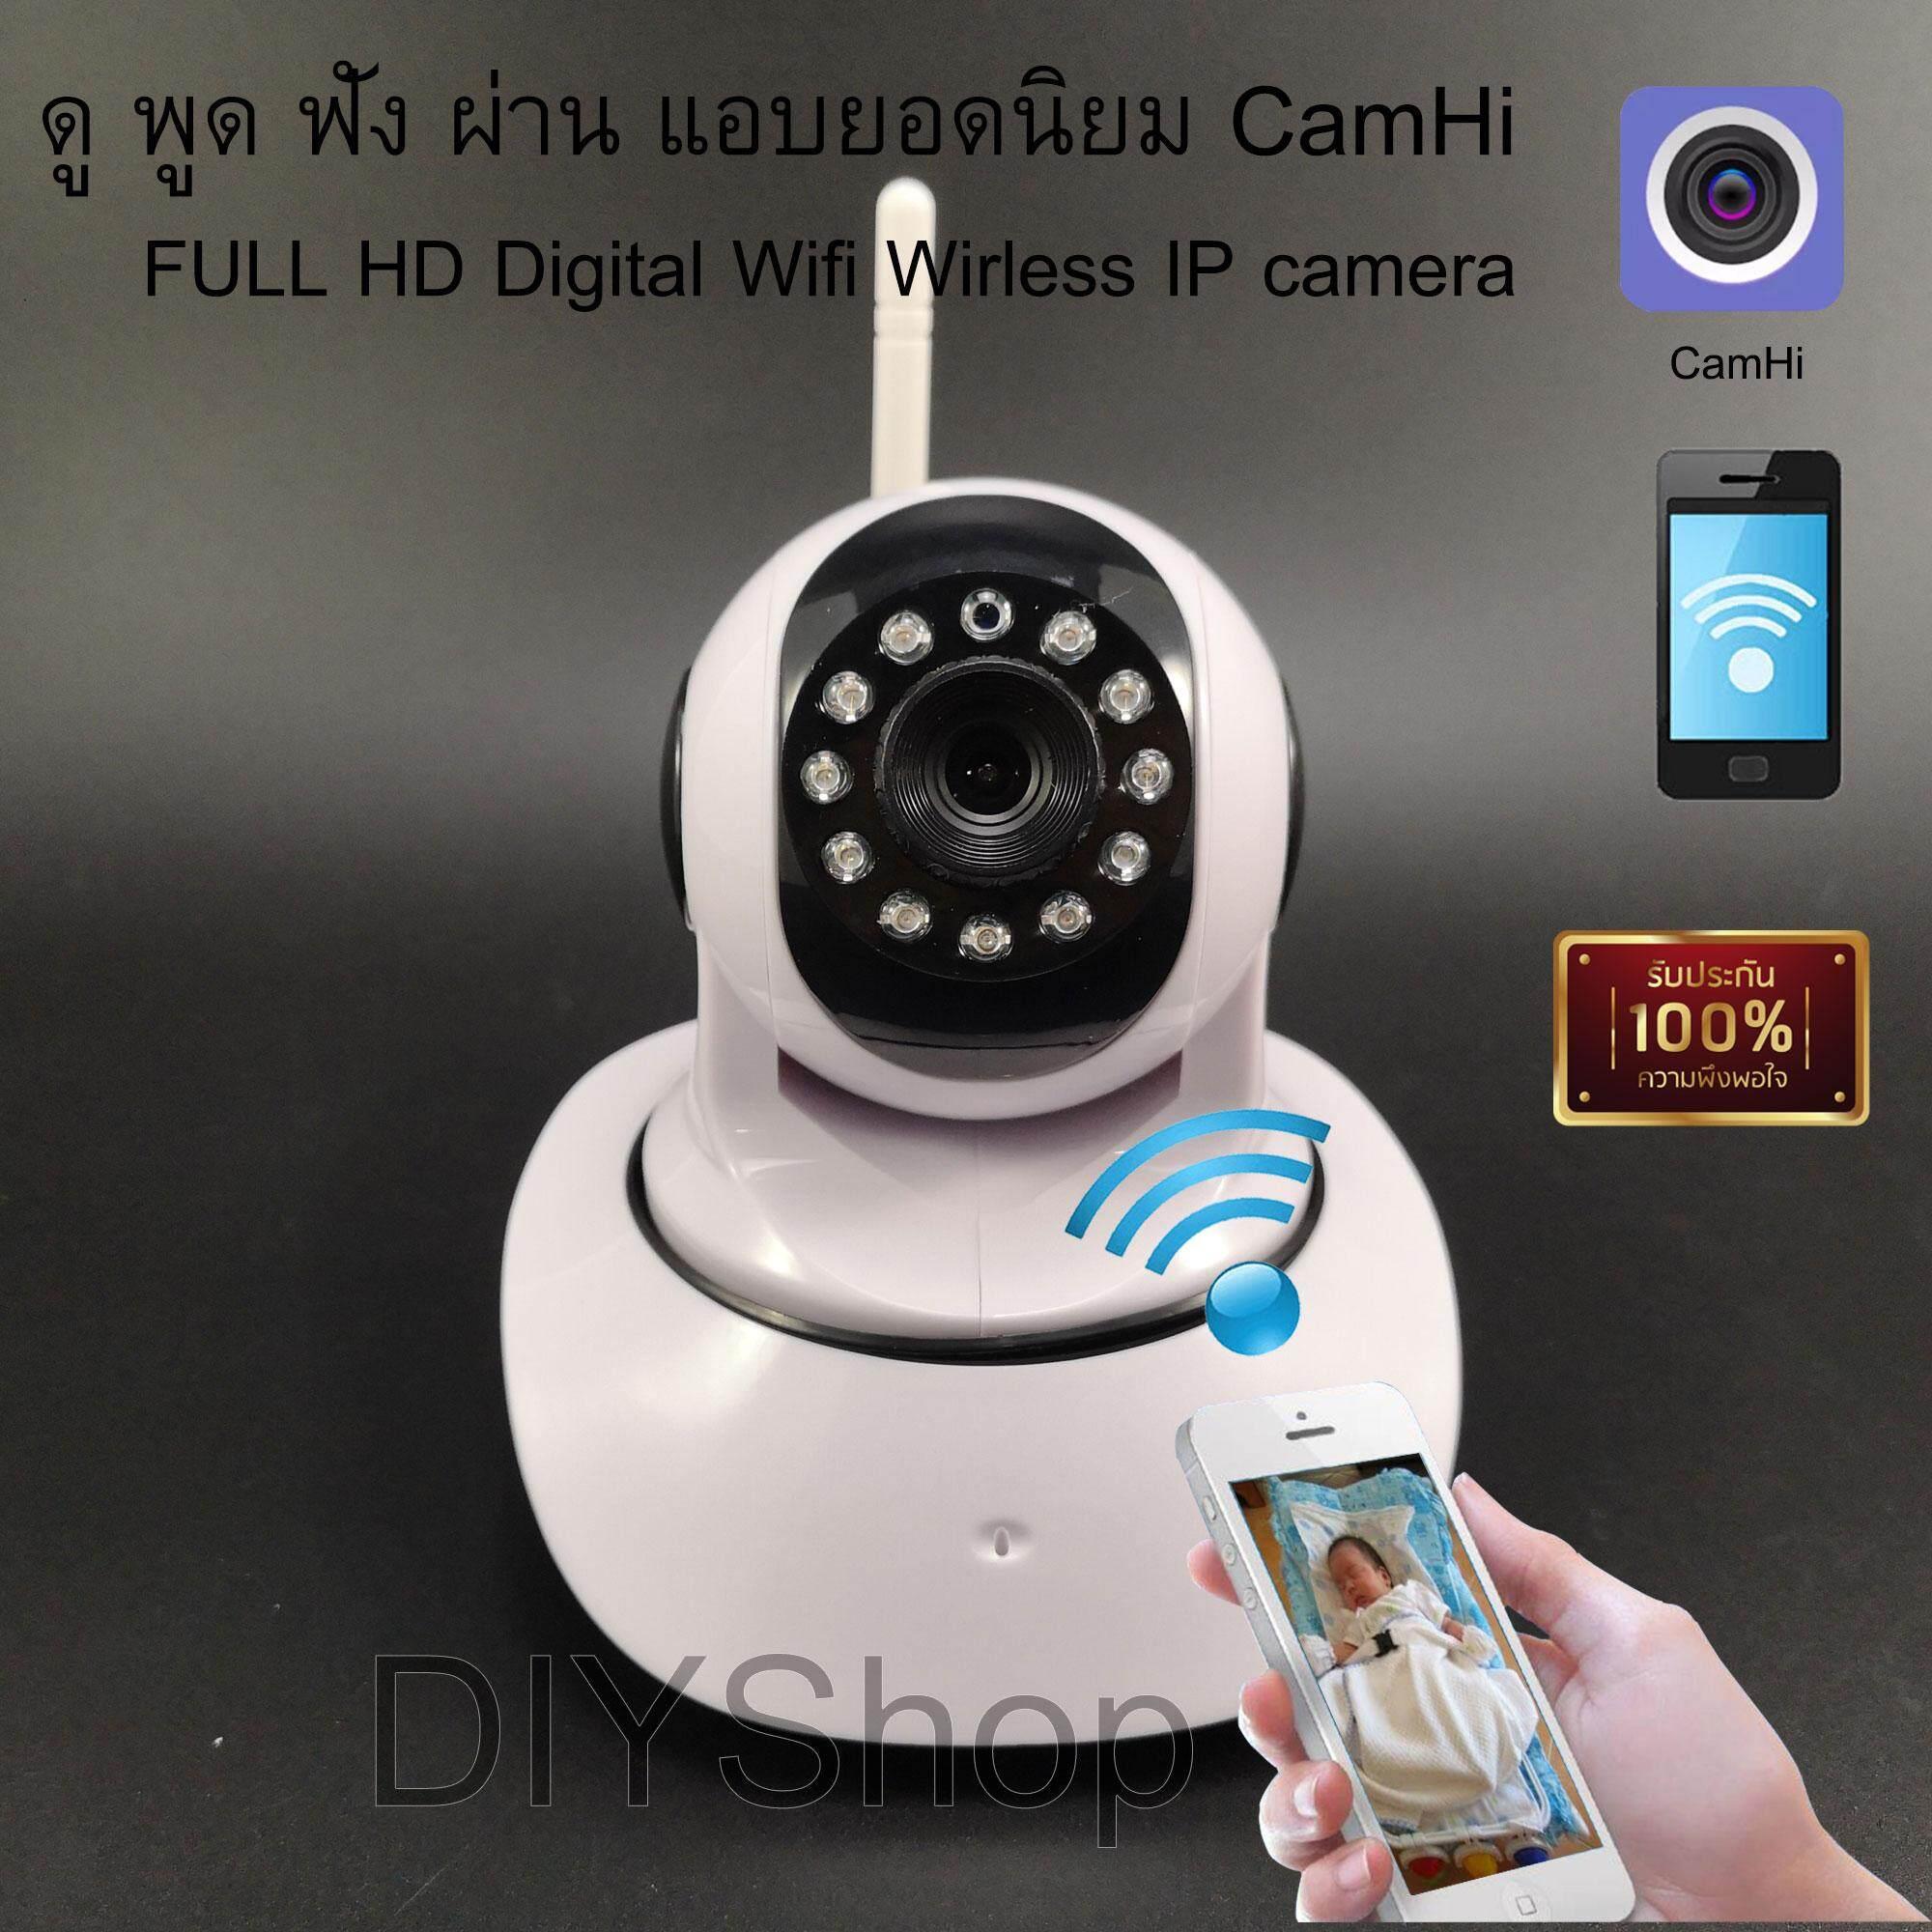 P2p กล้องวงจรปิด ไอพีแคม ชัดที่สุด ฟรีอะแดปเตอร์ ดู พูด ฟัง ผ่านแอบ ยอดนิยม Camhi Full Hd Digital Wifi Wirless Ip Camera  ติดตั้งง่ายมาก ดูภาพผ่าน มือถือ ดูบ้าน ร้านค้า เด็ก ลูกๆ ดูสัตว์เลี้ยง ดูภาพกลางคืนได้ กล้องรักษา ความปลอดภัย Wifi Home Security Fami.